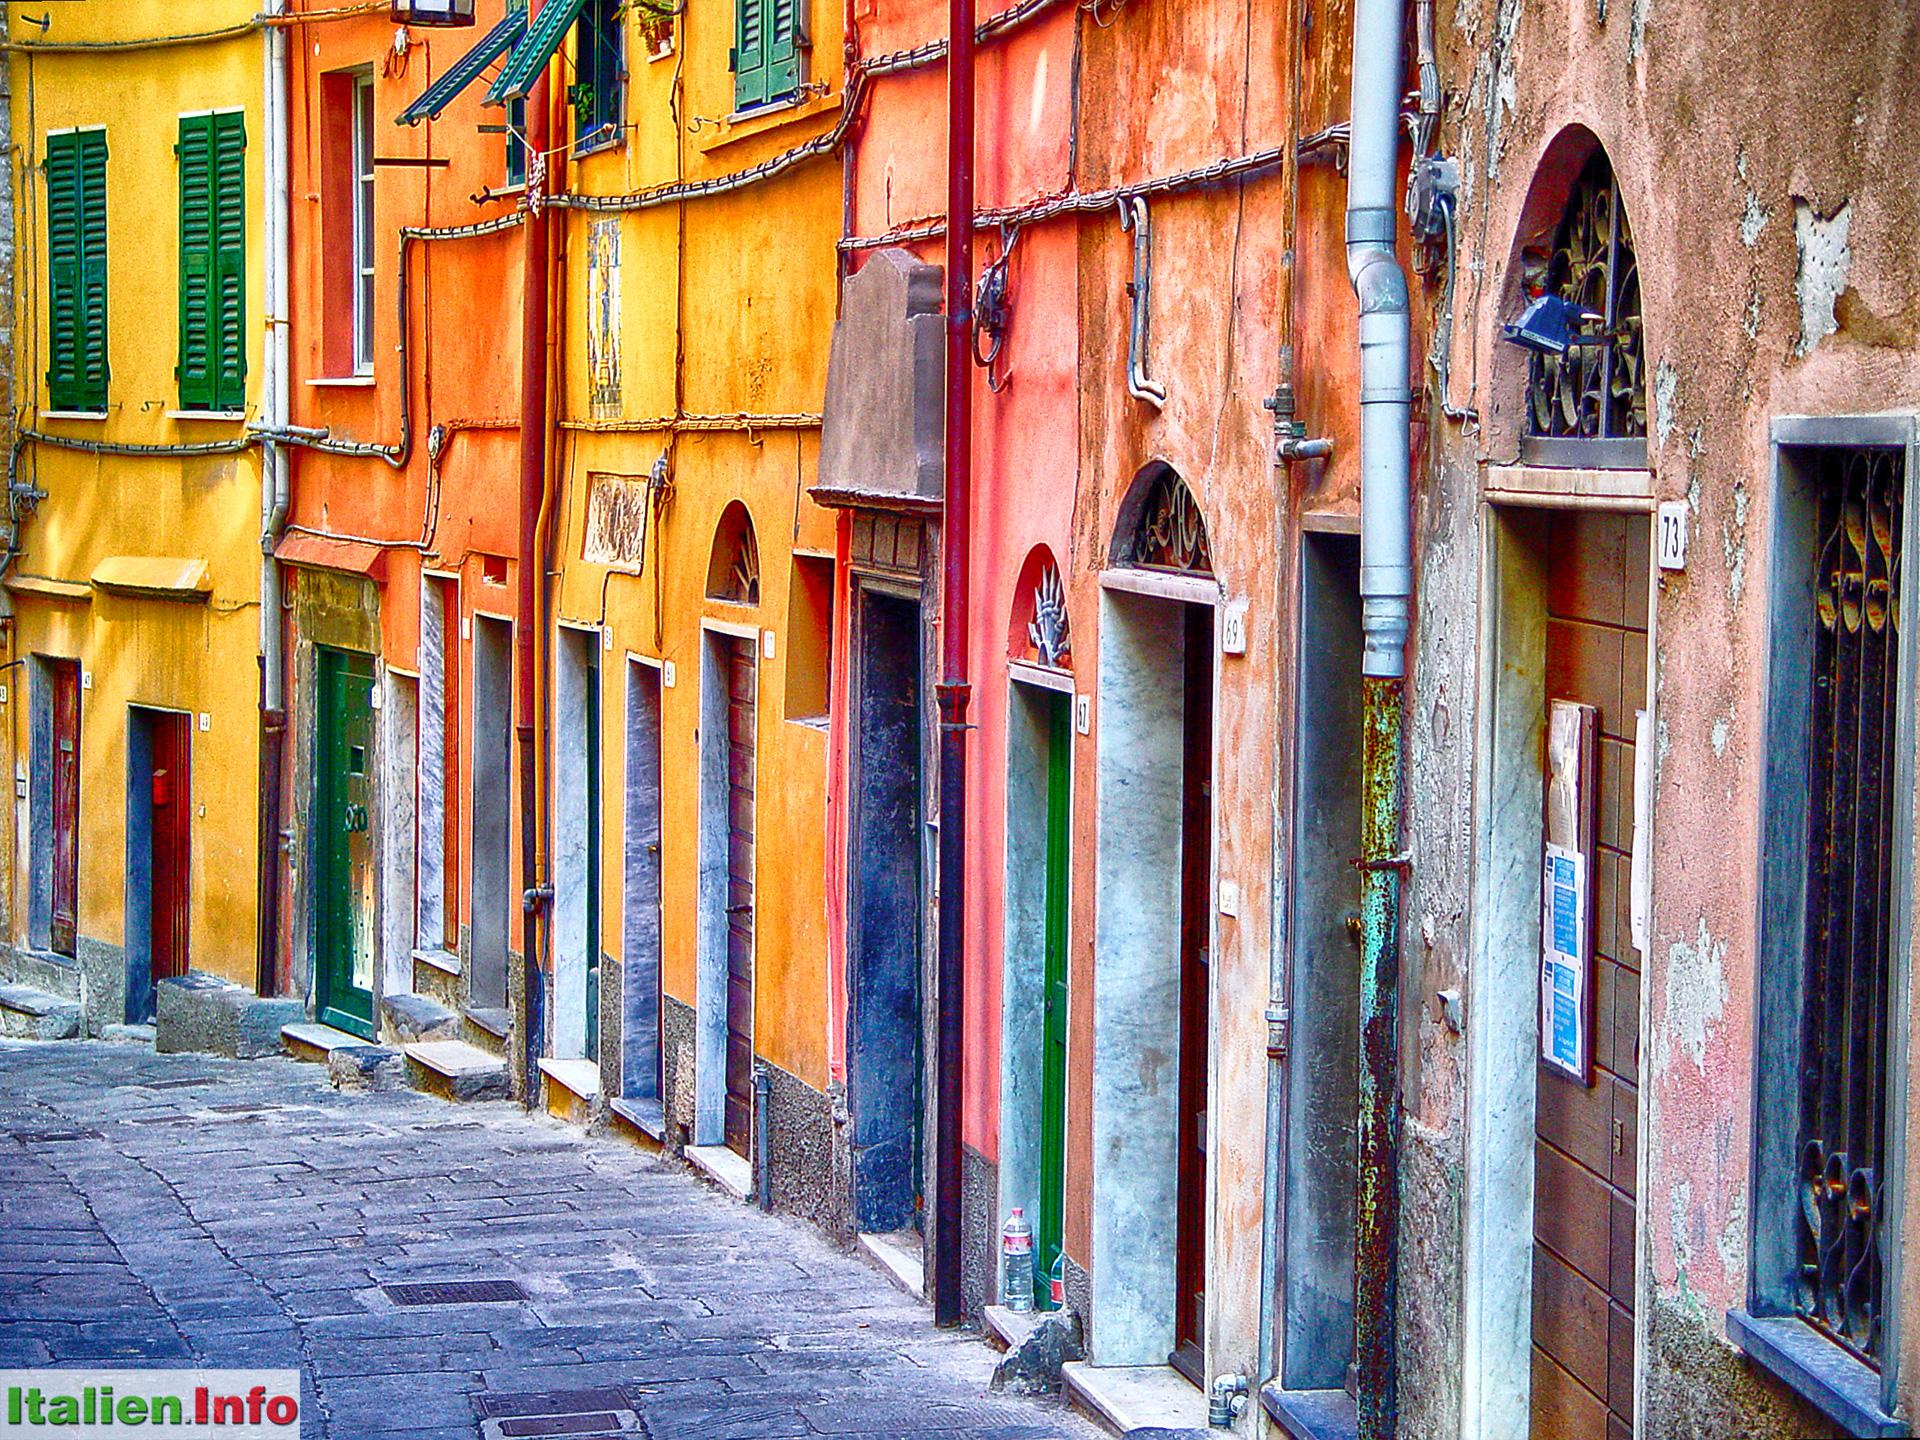 Portovenere - Impressionen: Fotos und Bilder - Italien.Info size: 1024 x 768 post ID: 9 File size: 0 B